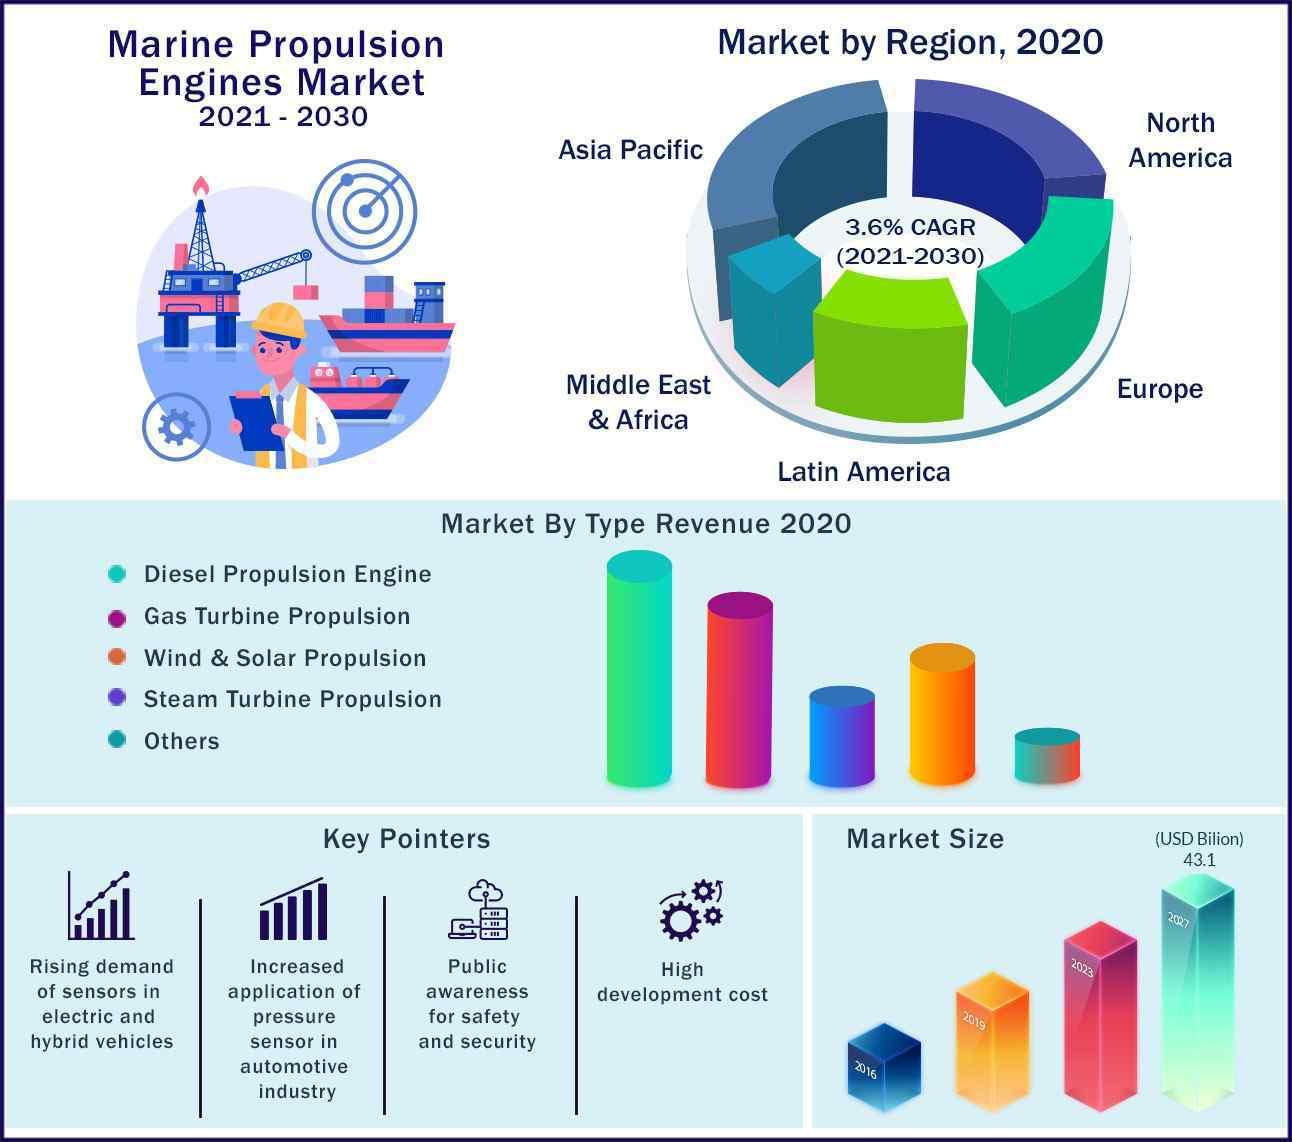 Global Marine Propulsion Engines Market 2021-2030